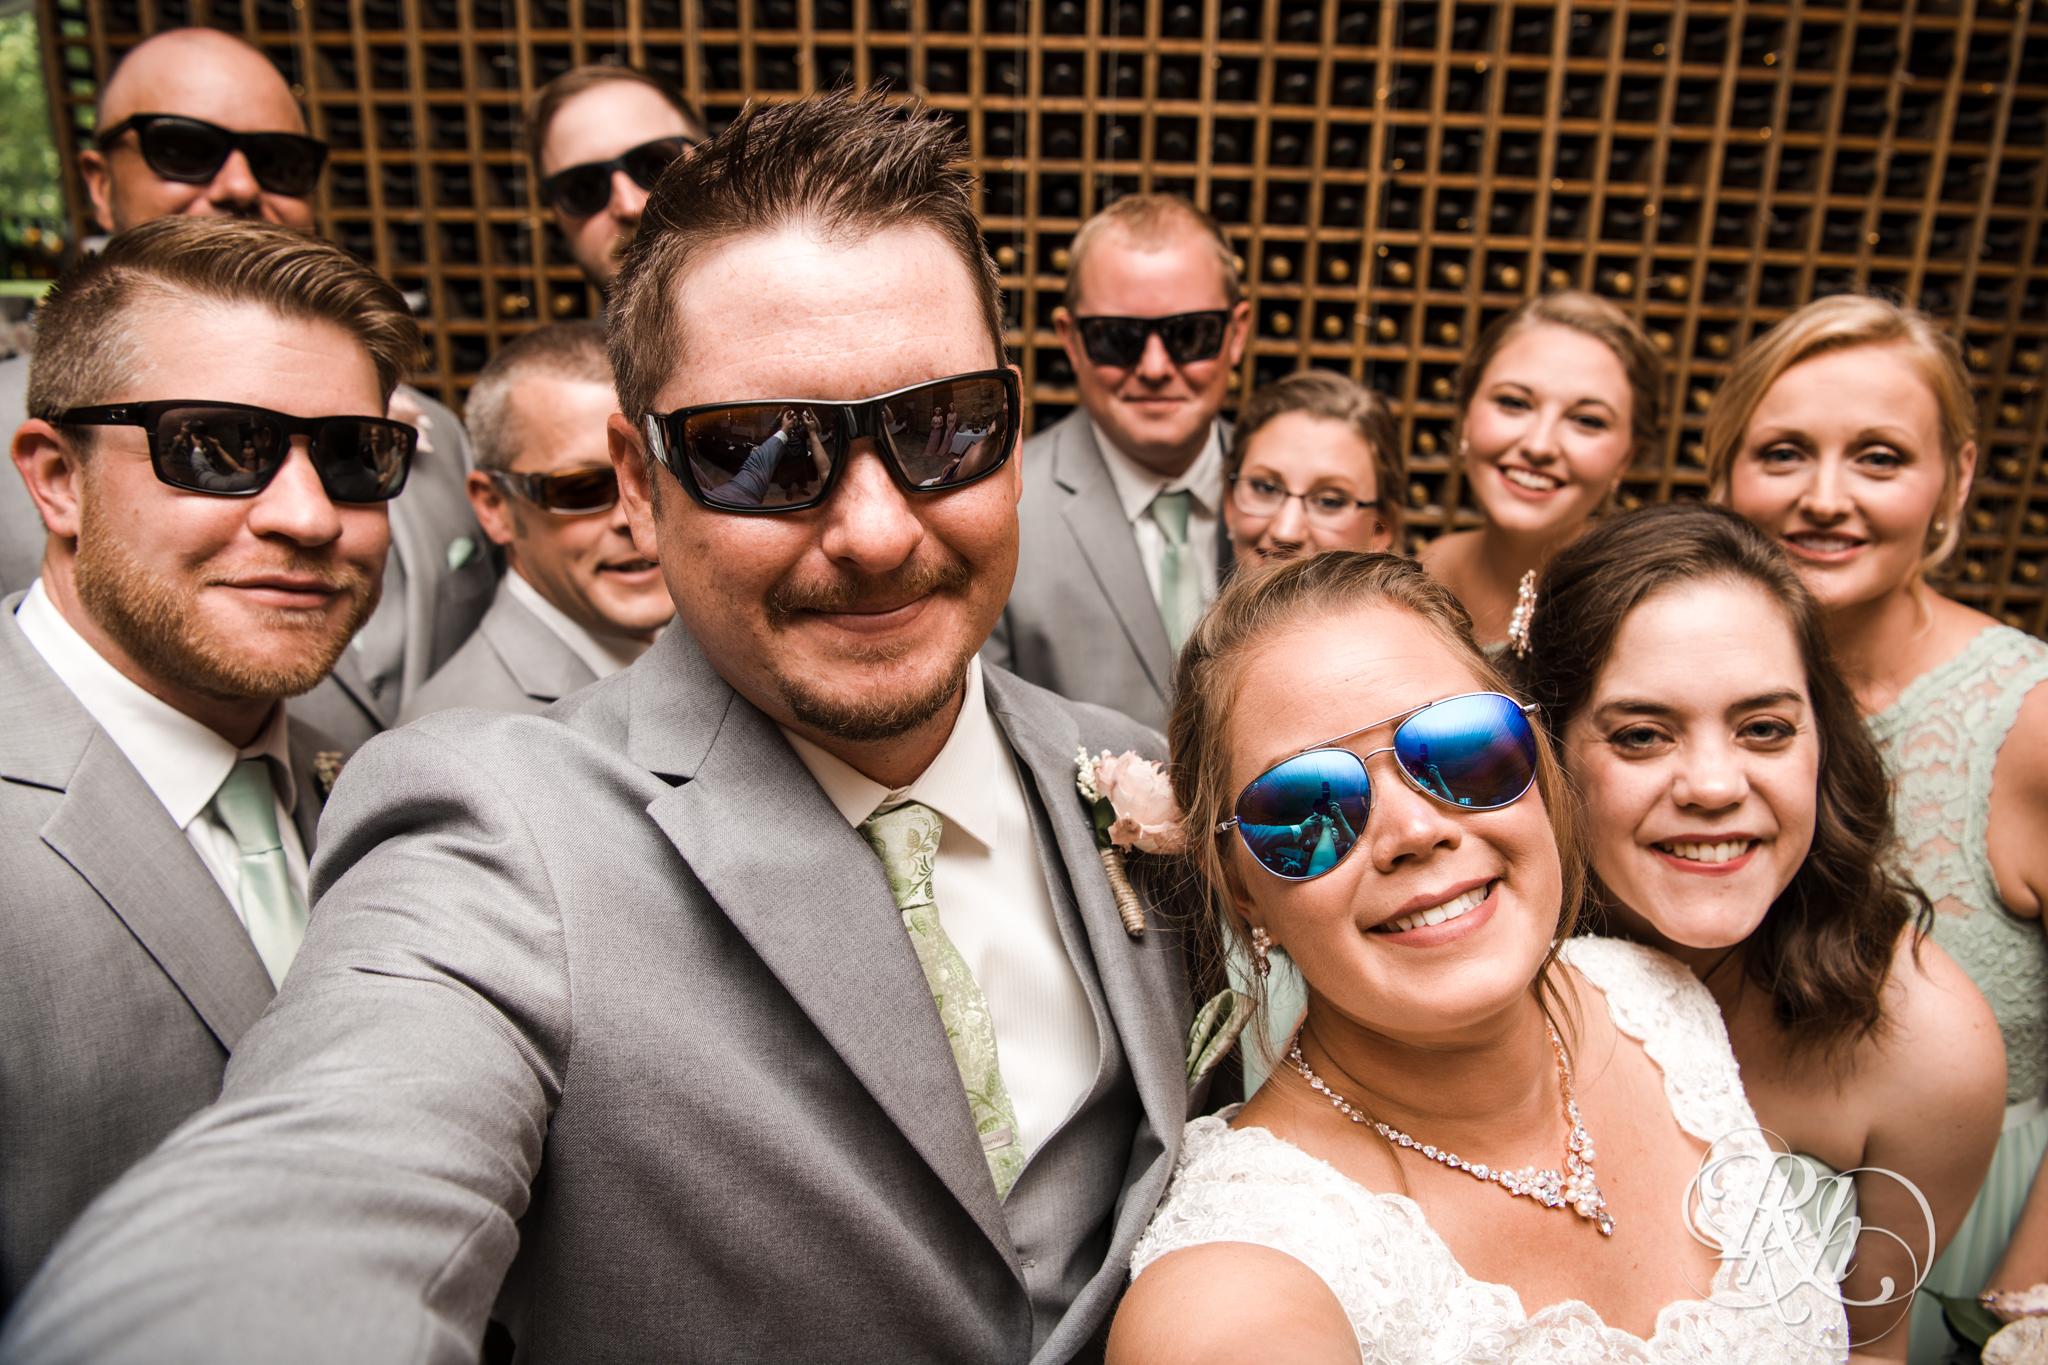 Ally & Nick - Minnesota Wedding Photography - Next Chapter Winery - RKH Images - Blog (27 of 57).jpg